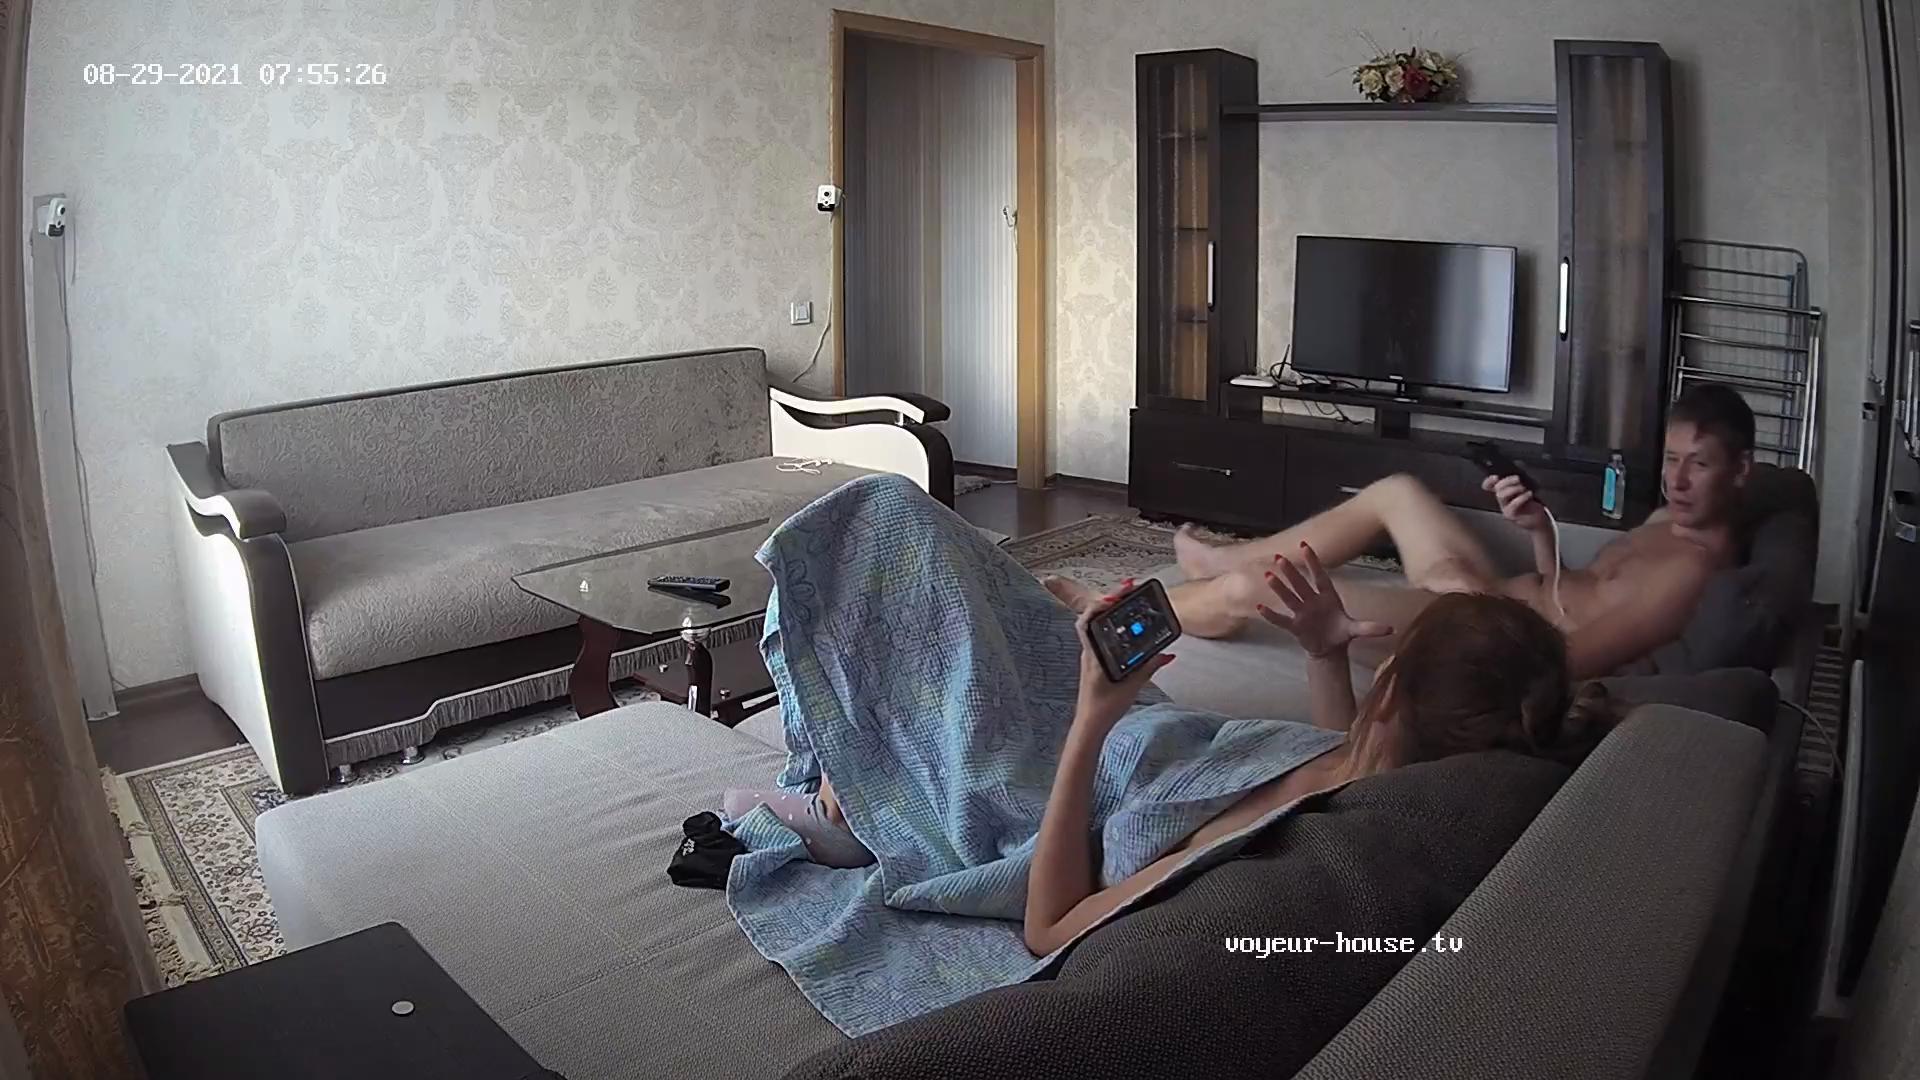 Archi jerking after sex 29 Aug 2021 cam 2